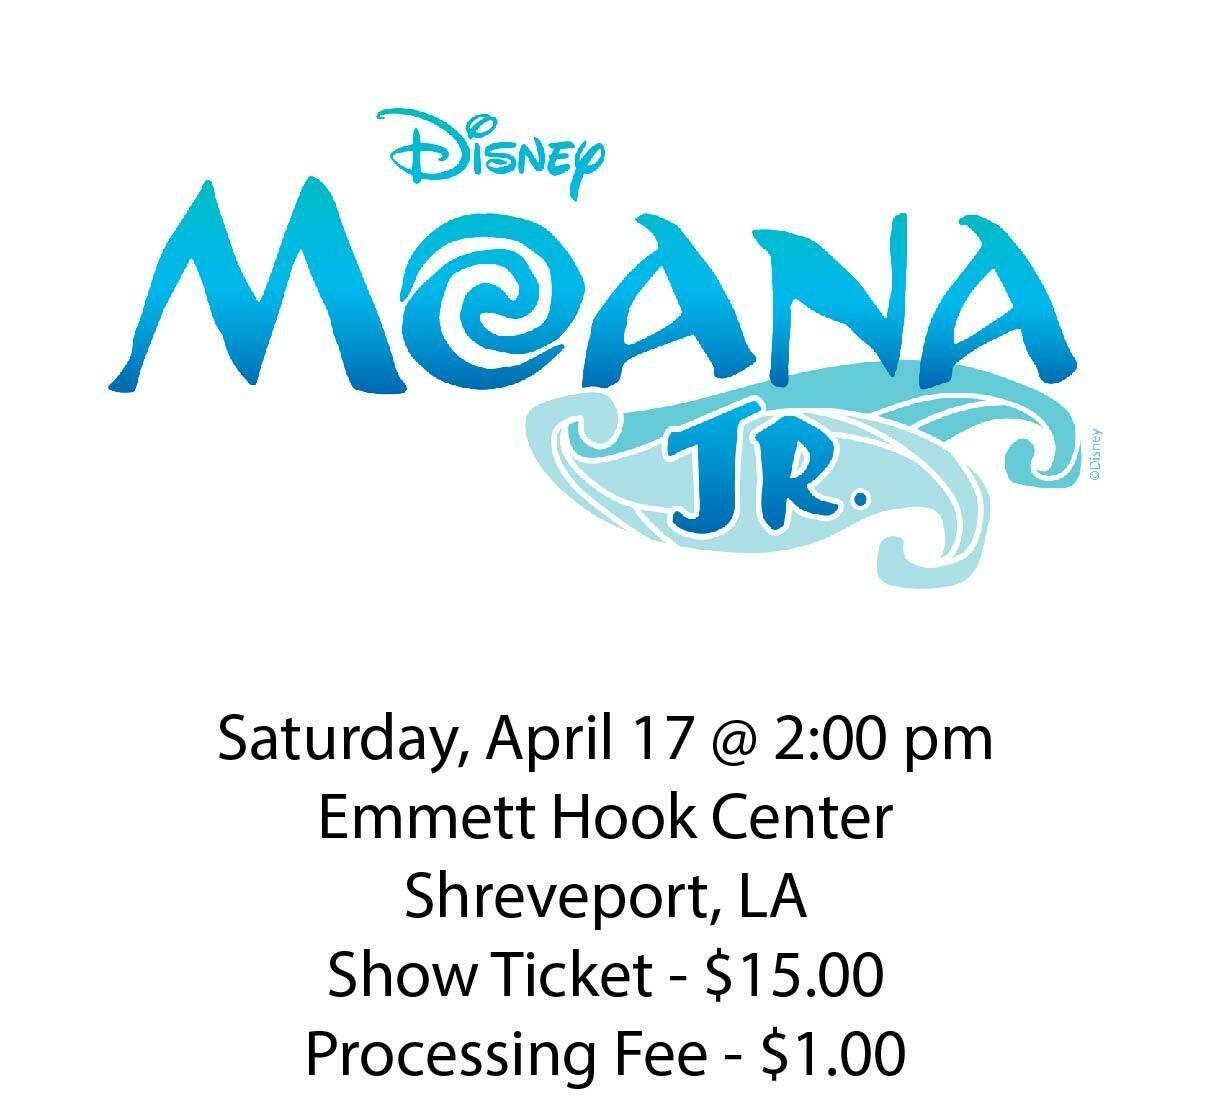 Disney's Moana JR., Saturday April 17th @ 2:00 pm